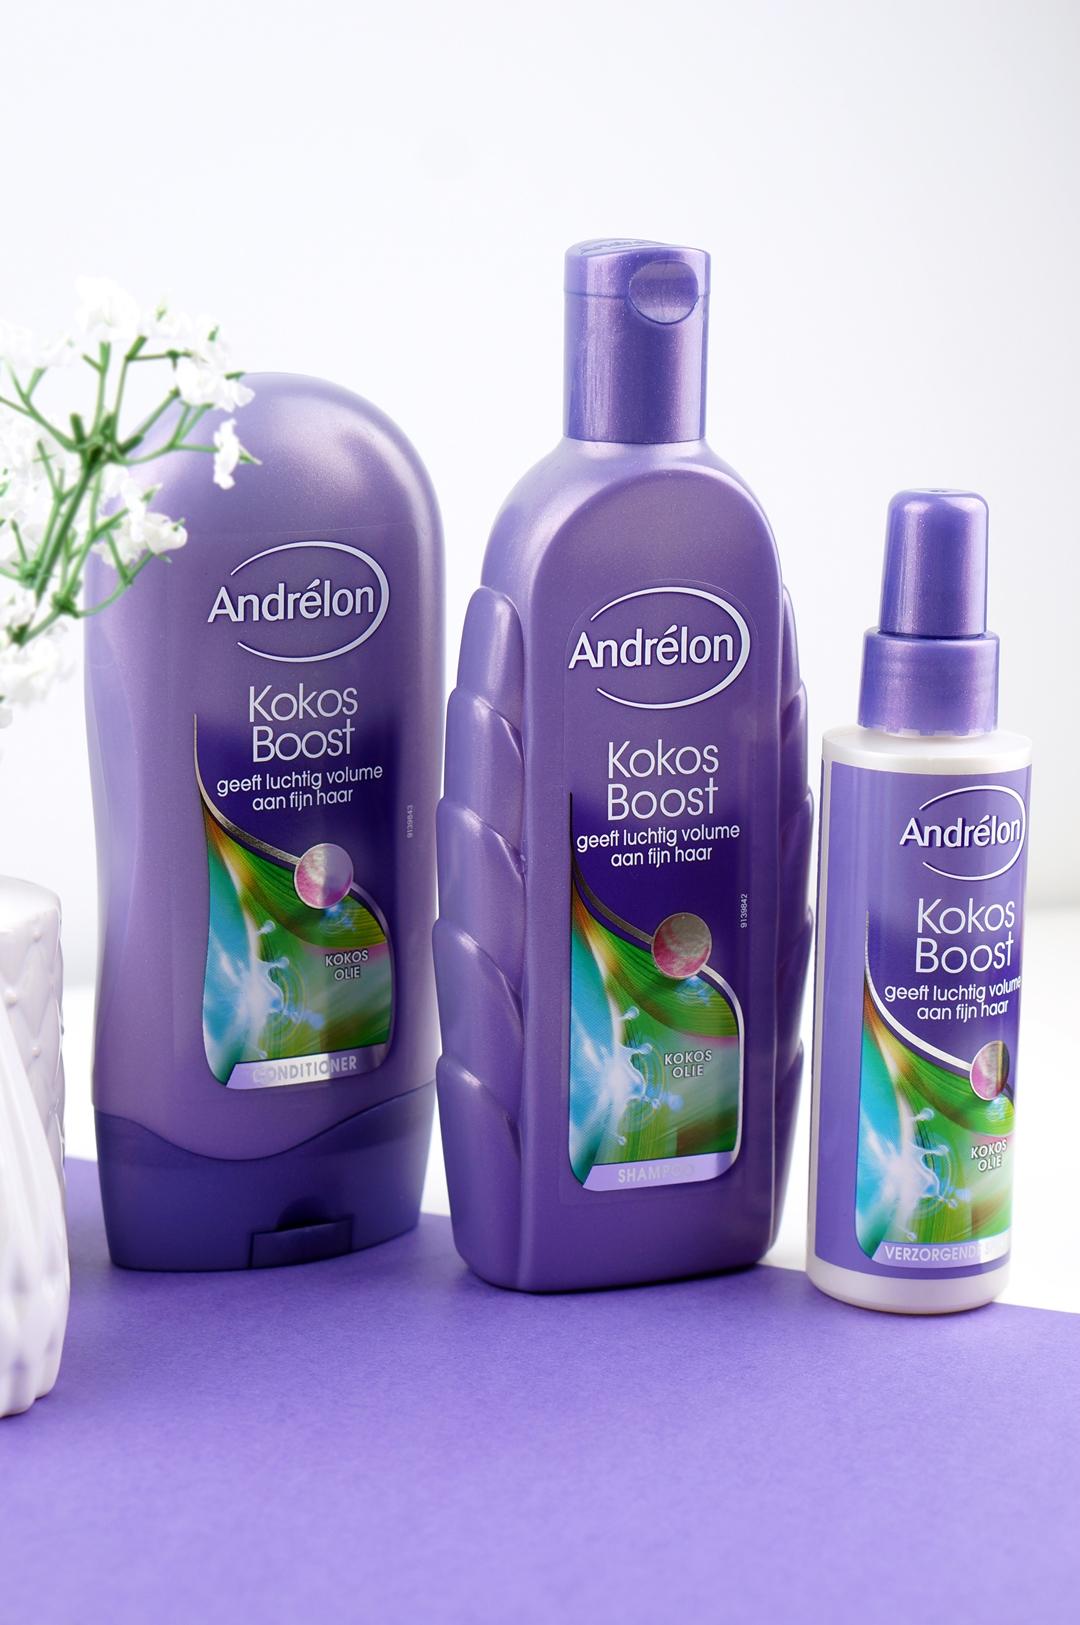 Andrélon Kokos Boost - luchtig volume & intense voeding